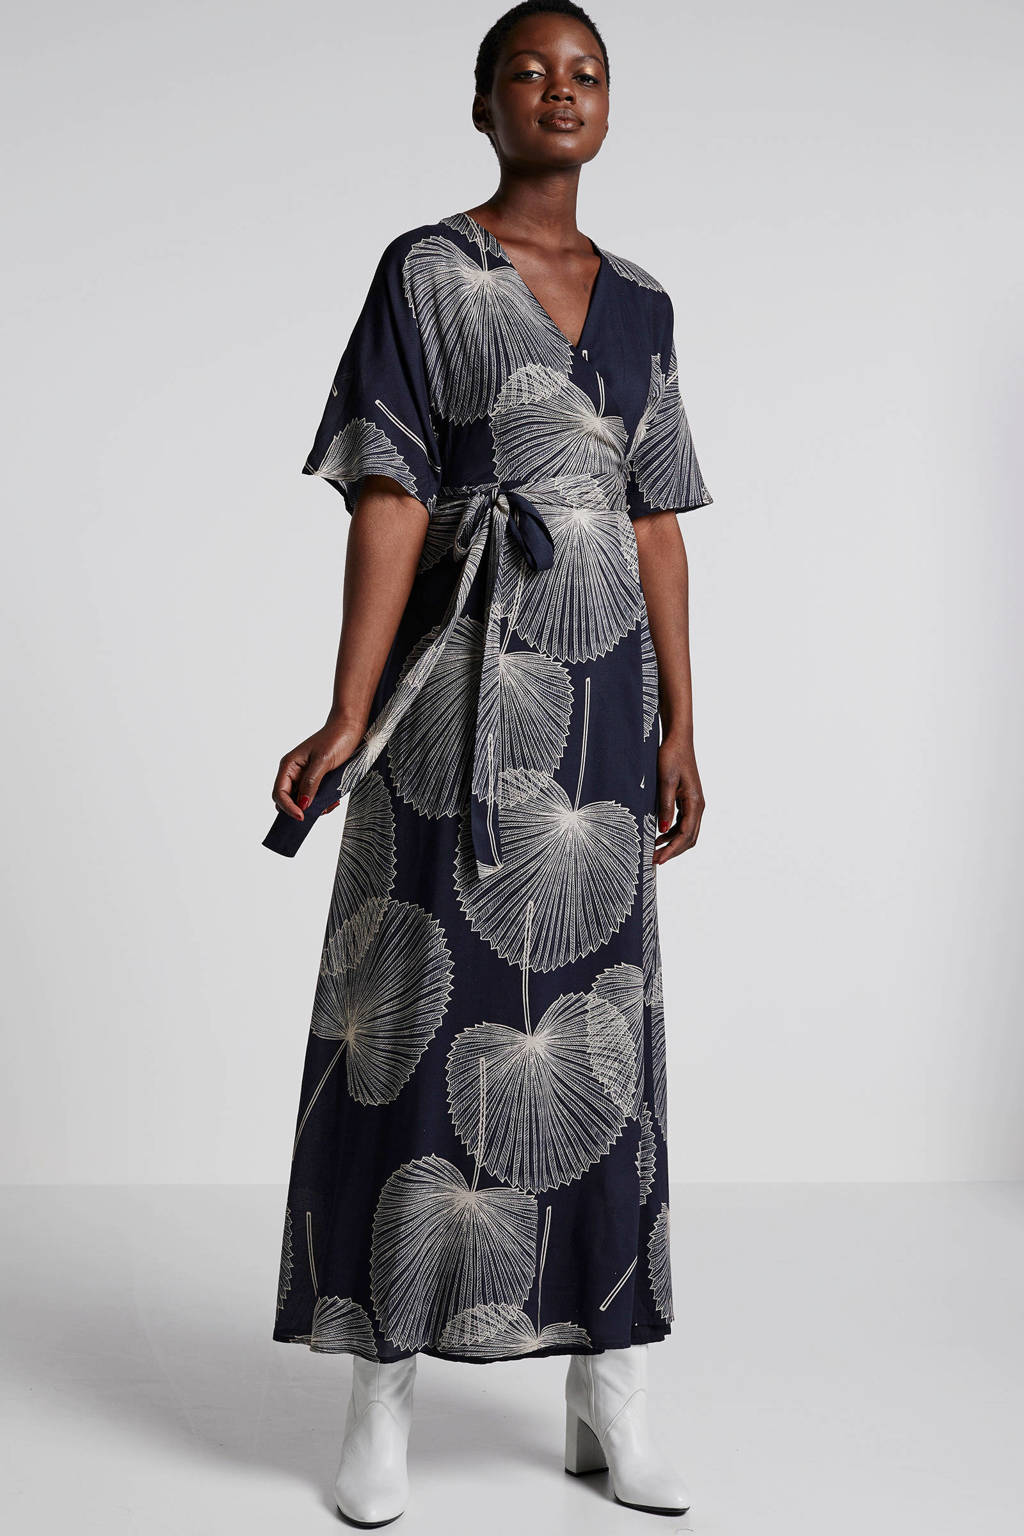 ESPRIT Women Collection maxi jurk met blad print zwart, Zwart/wit